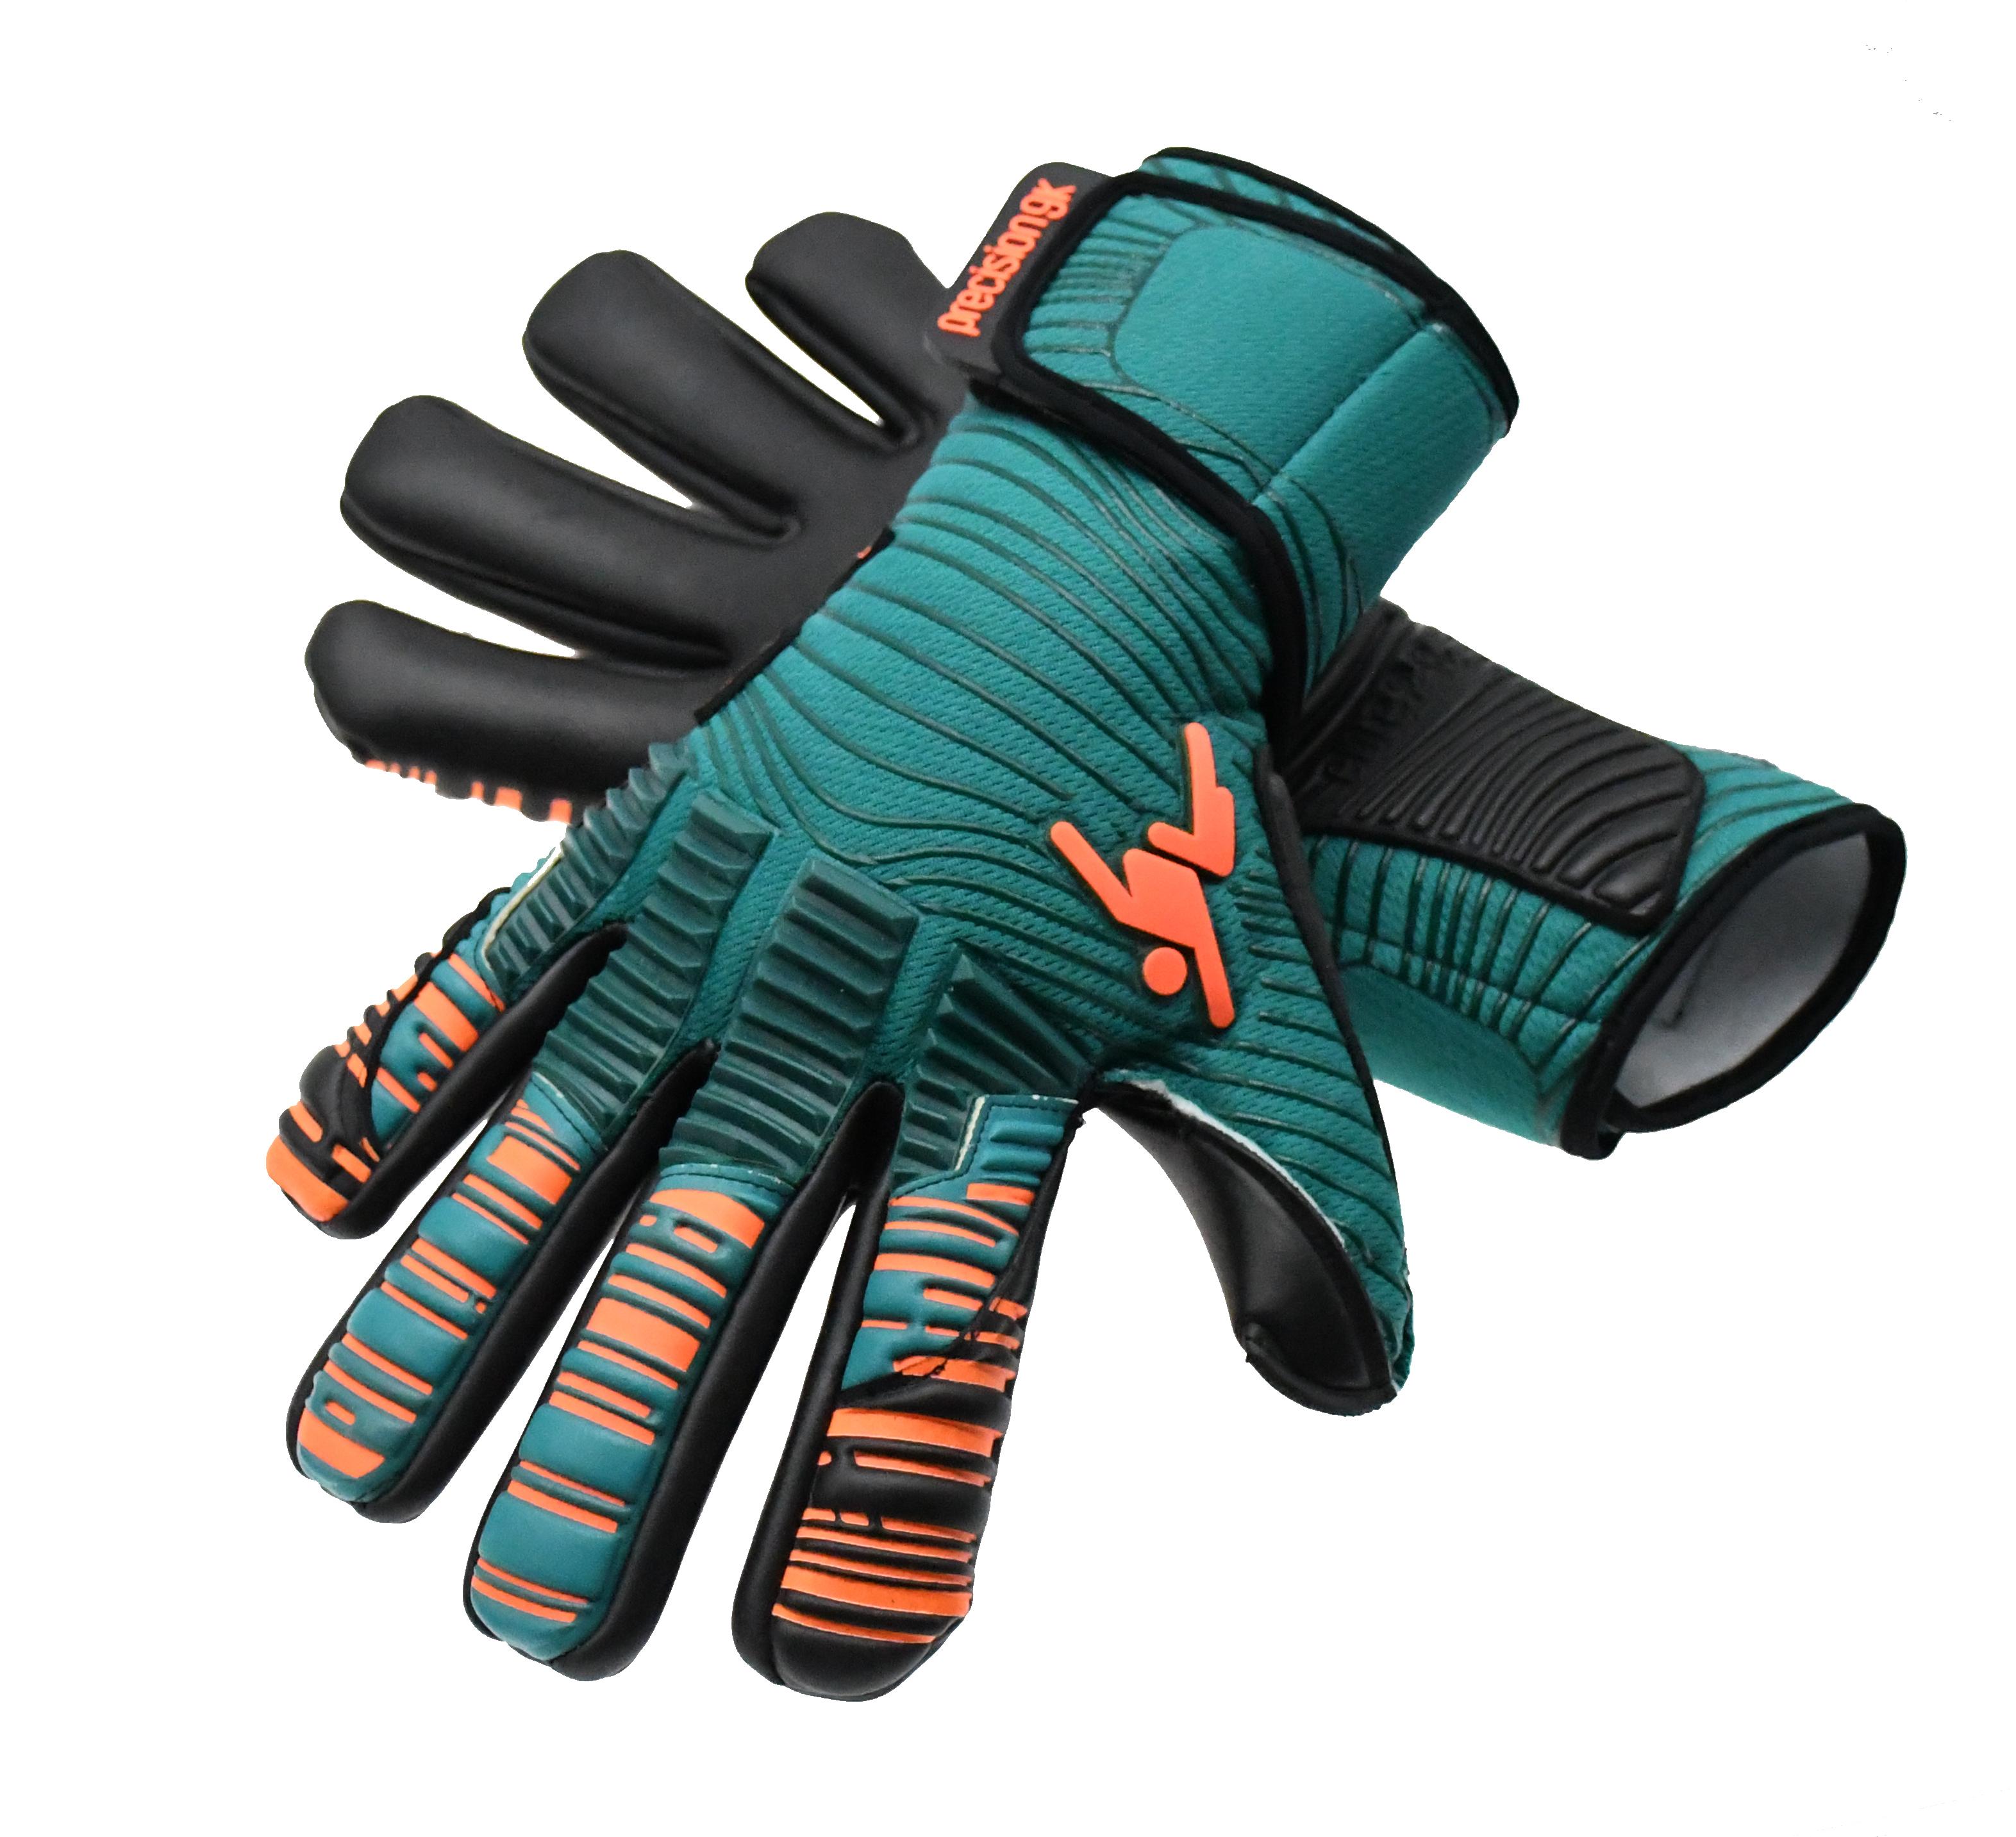 Elite Contact GK Gloves